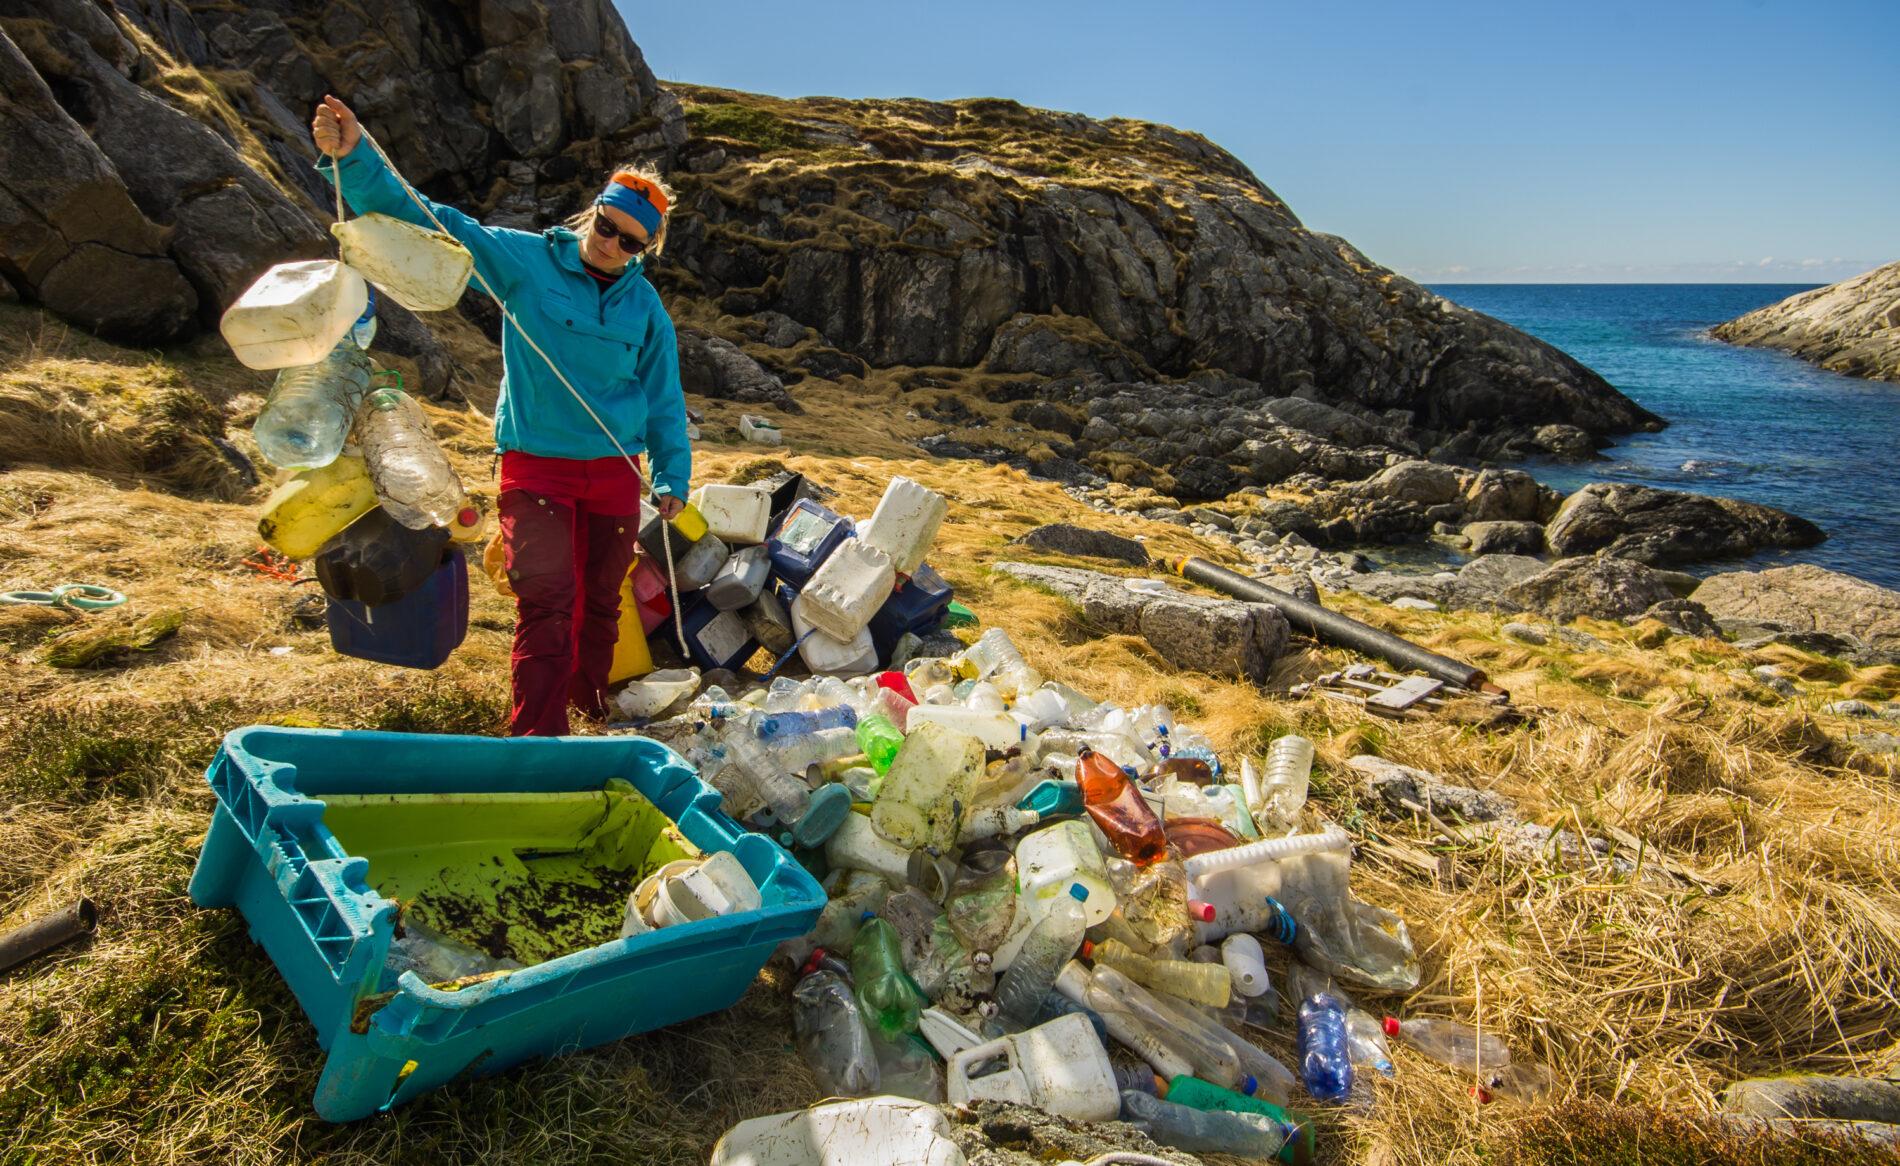 Plastsøppelifjæra Bo Eide